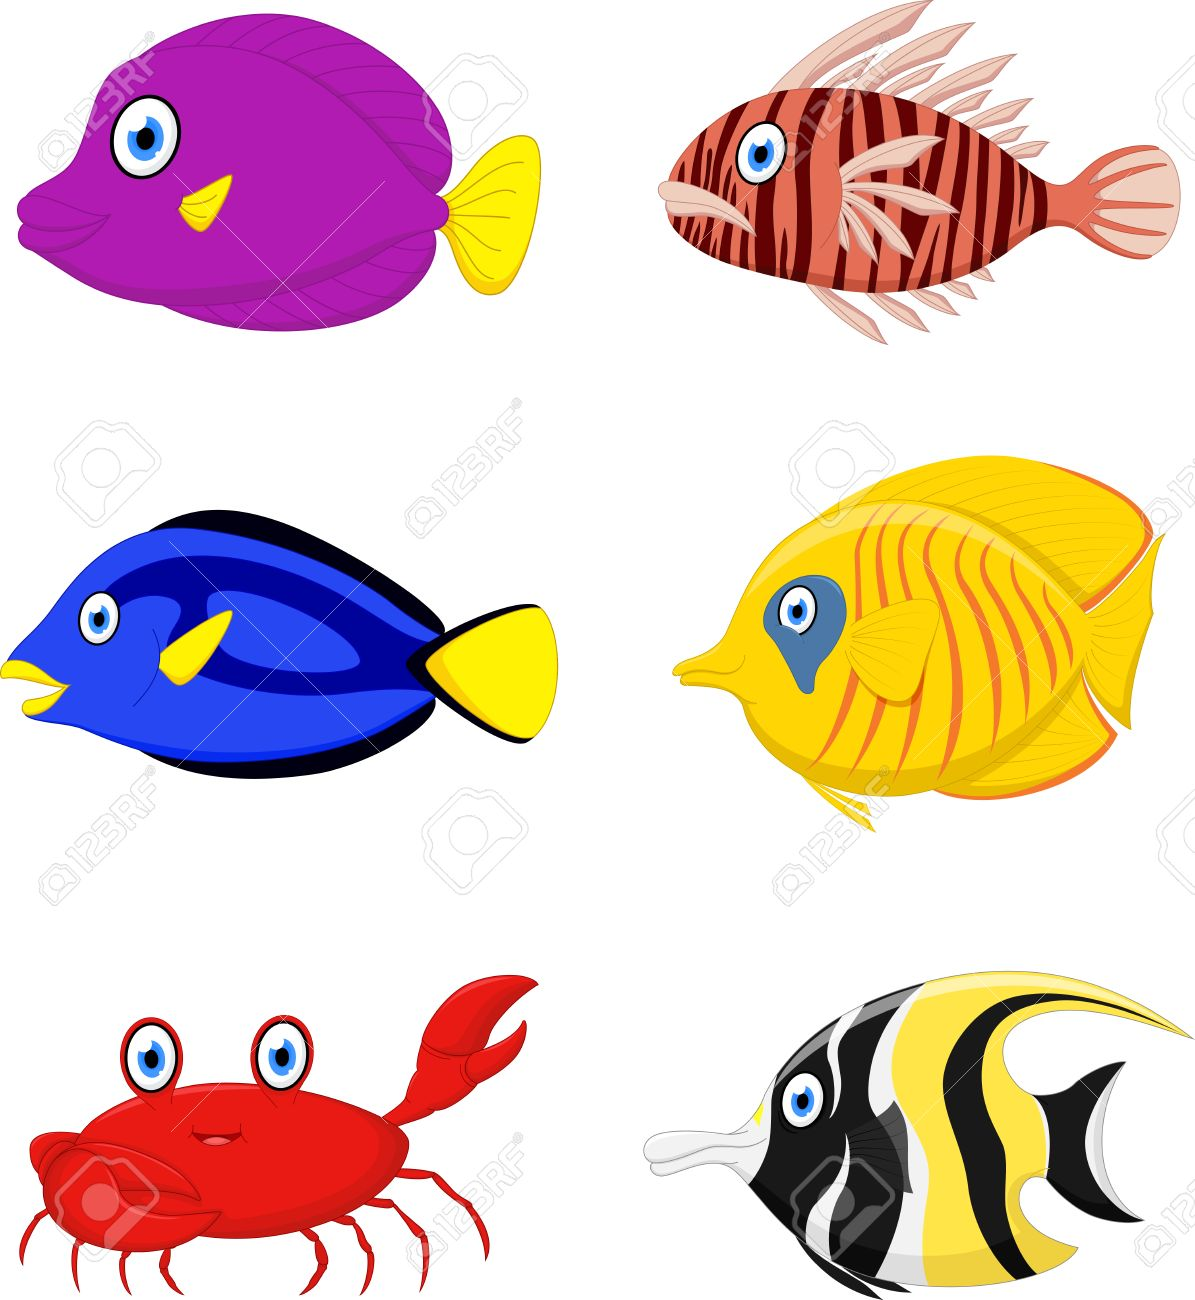 tropical fish cartoon royalty free cliparts vectors and stock